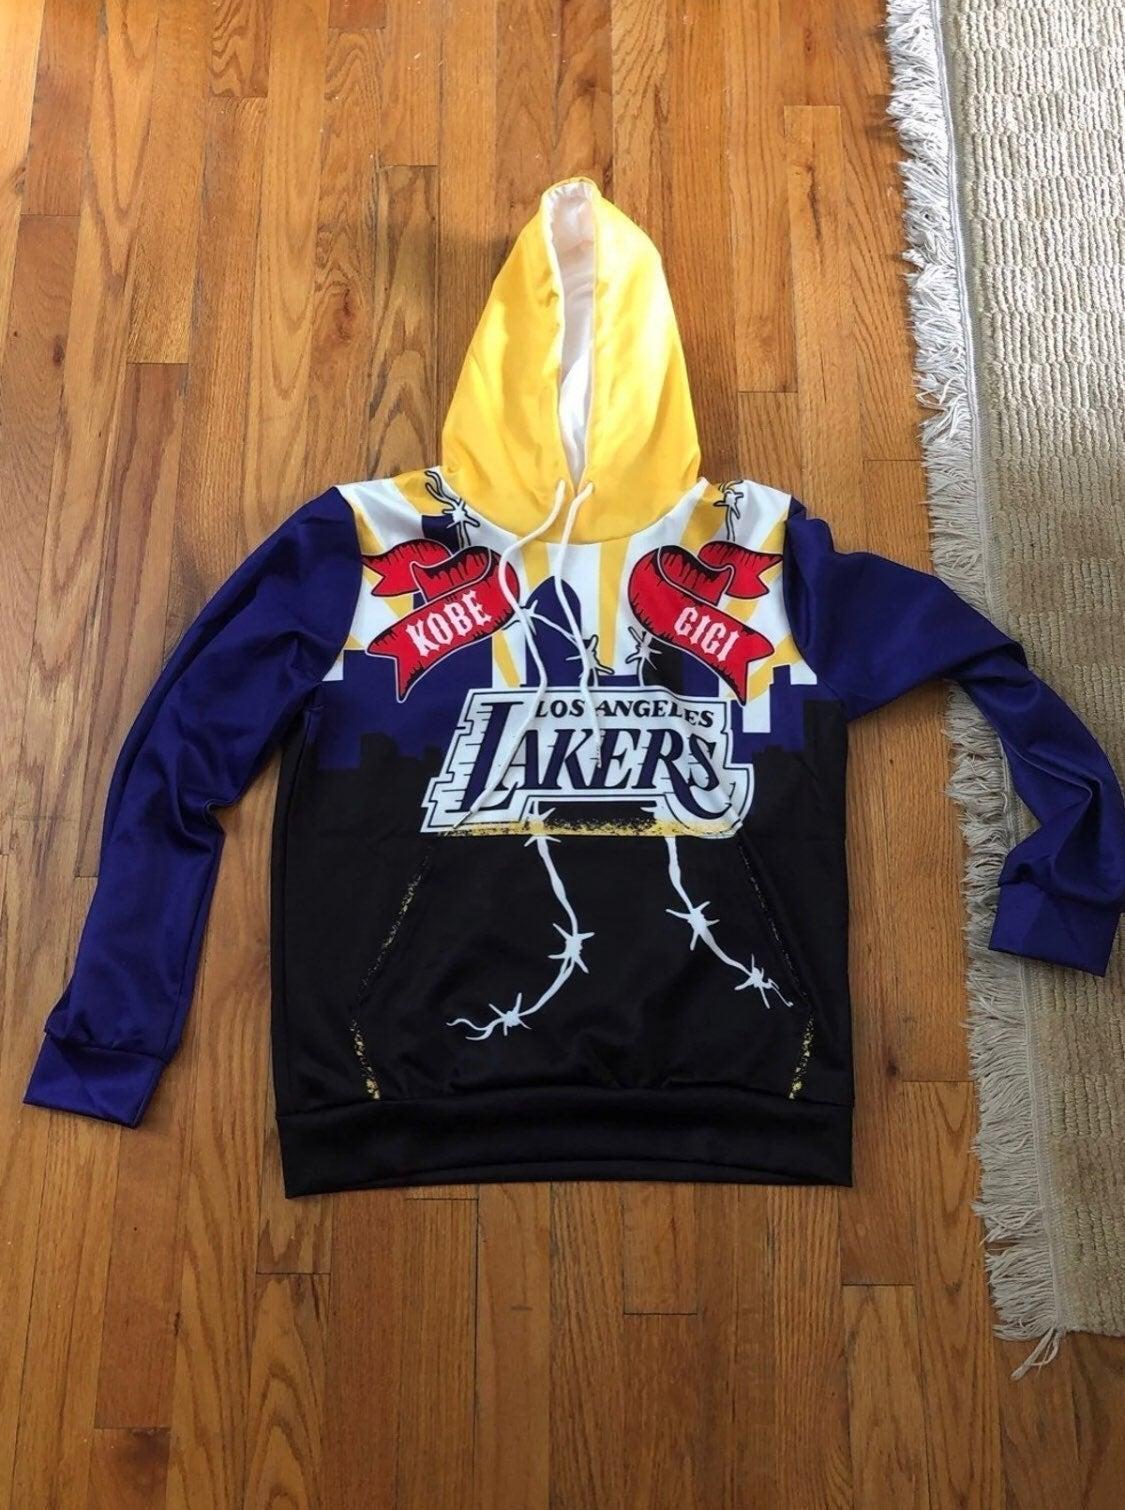 Kobe Bryant Gigi Bryant Lakers Hoodie M